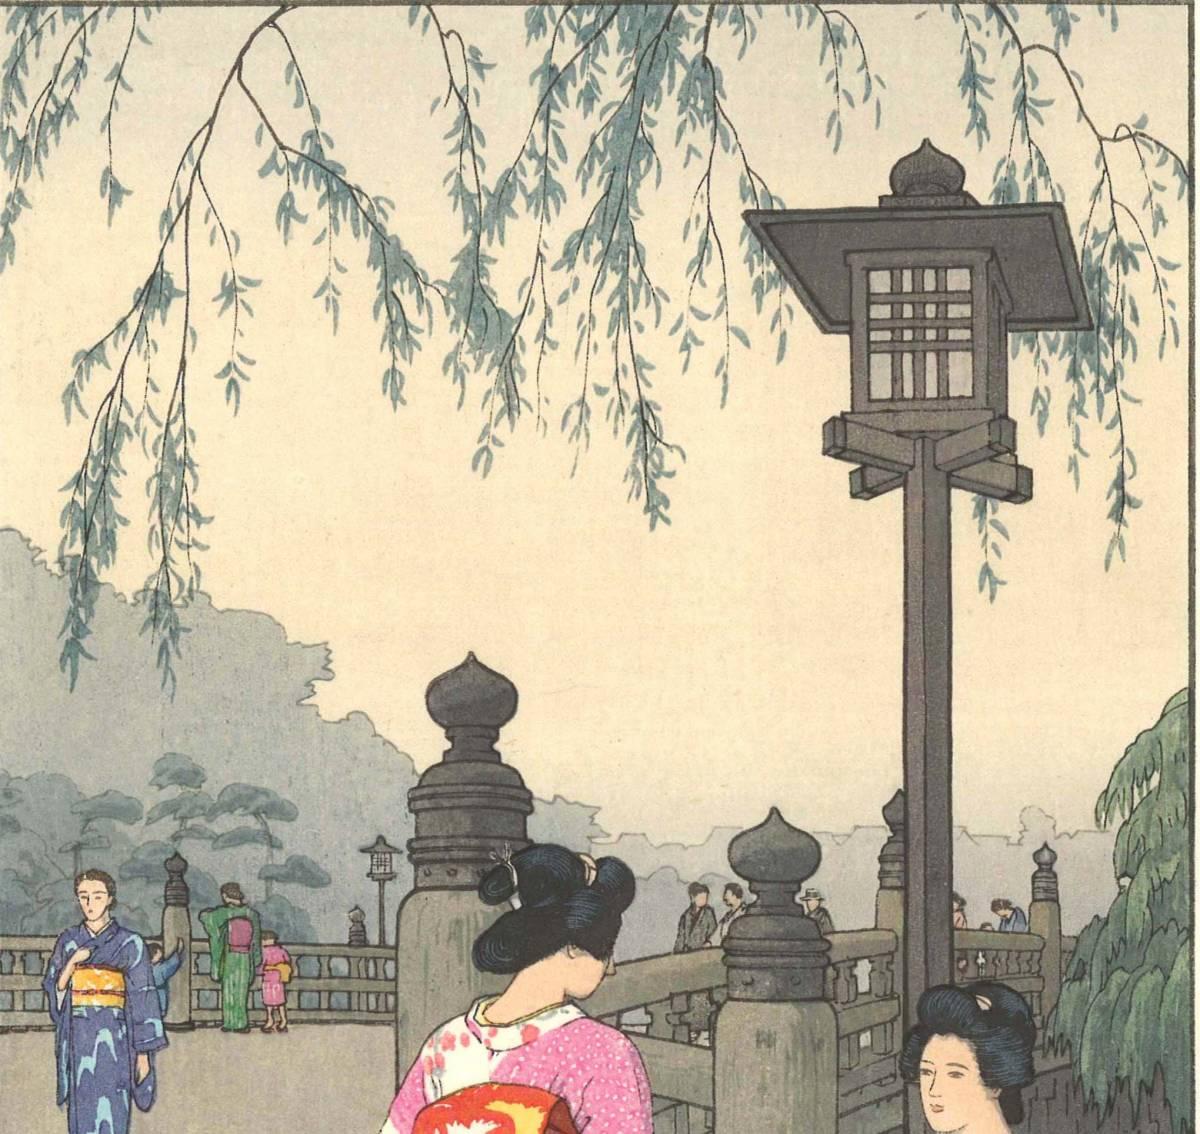 吉田遠志 木版画  014103 弁慶橋 (Benkei Bridge)  初摺1941年    最高峰の摺師の技をご堪能下さい!!_画像5